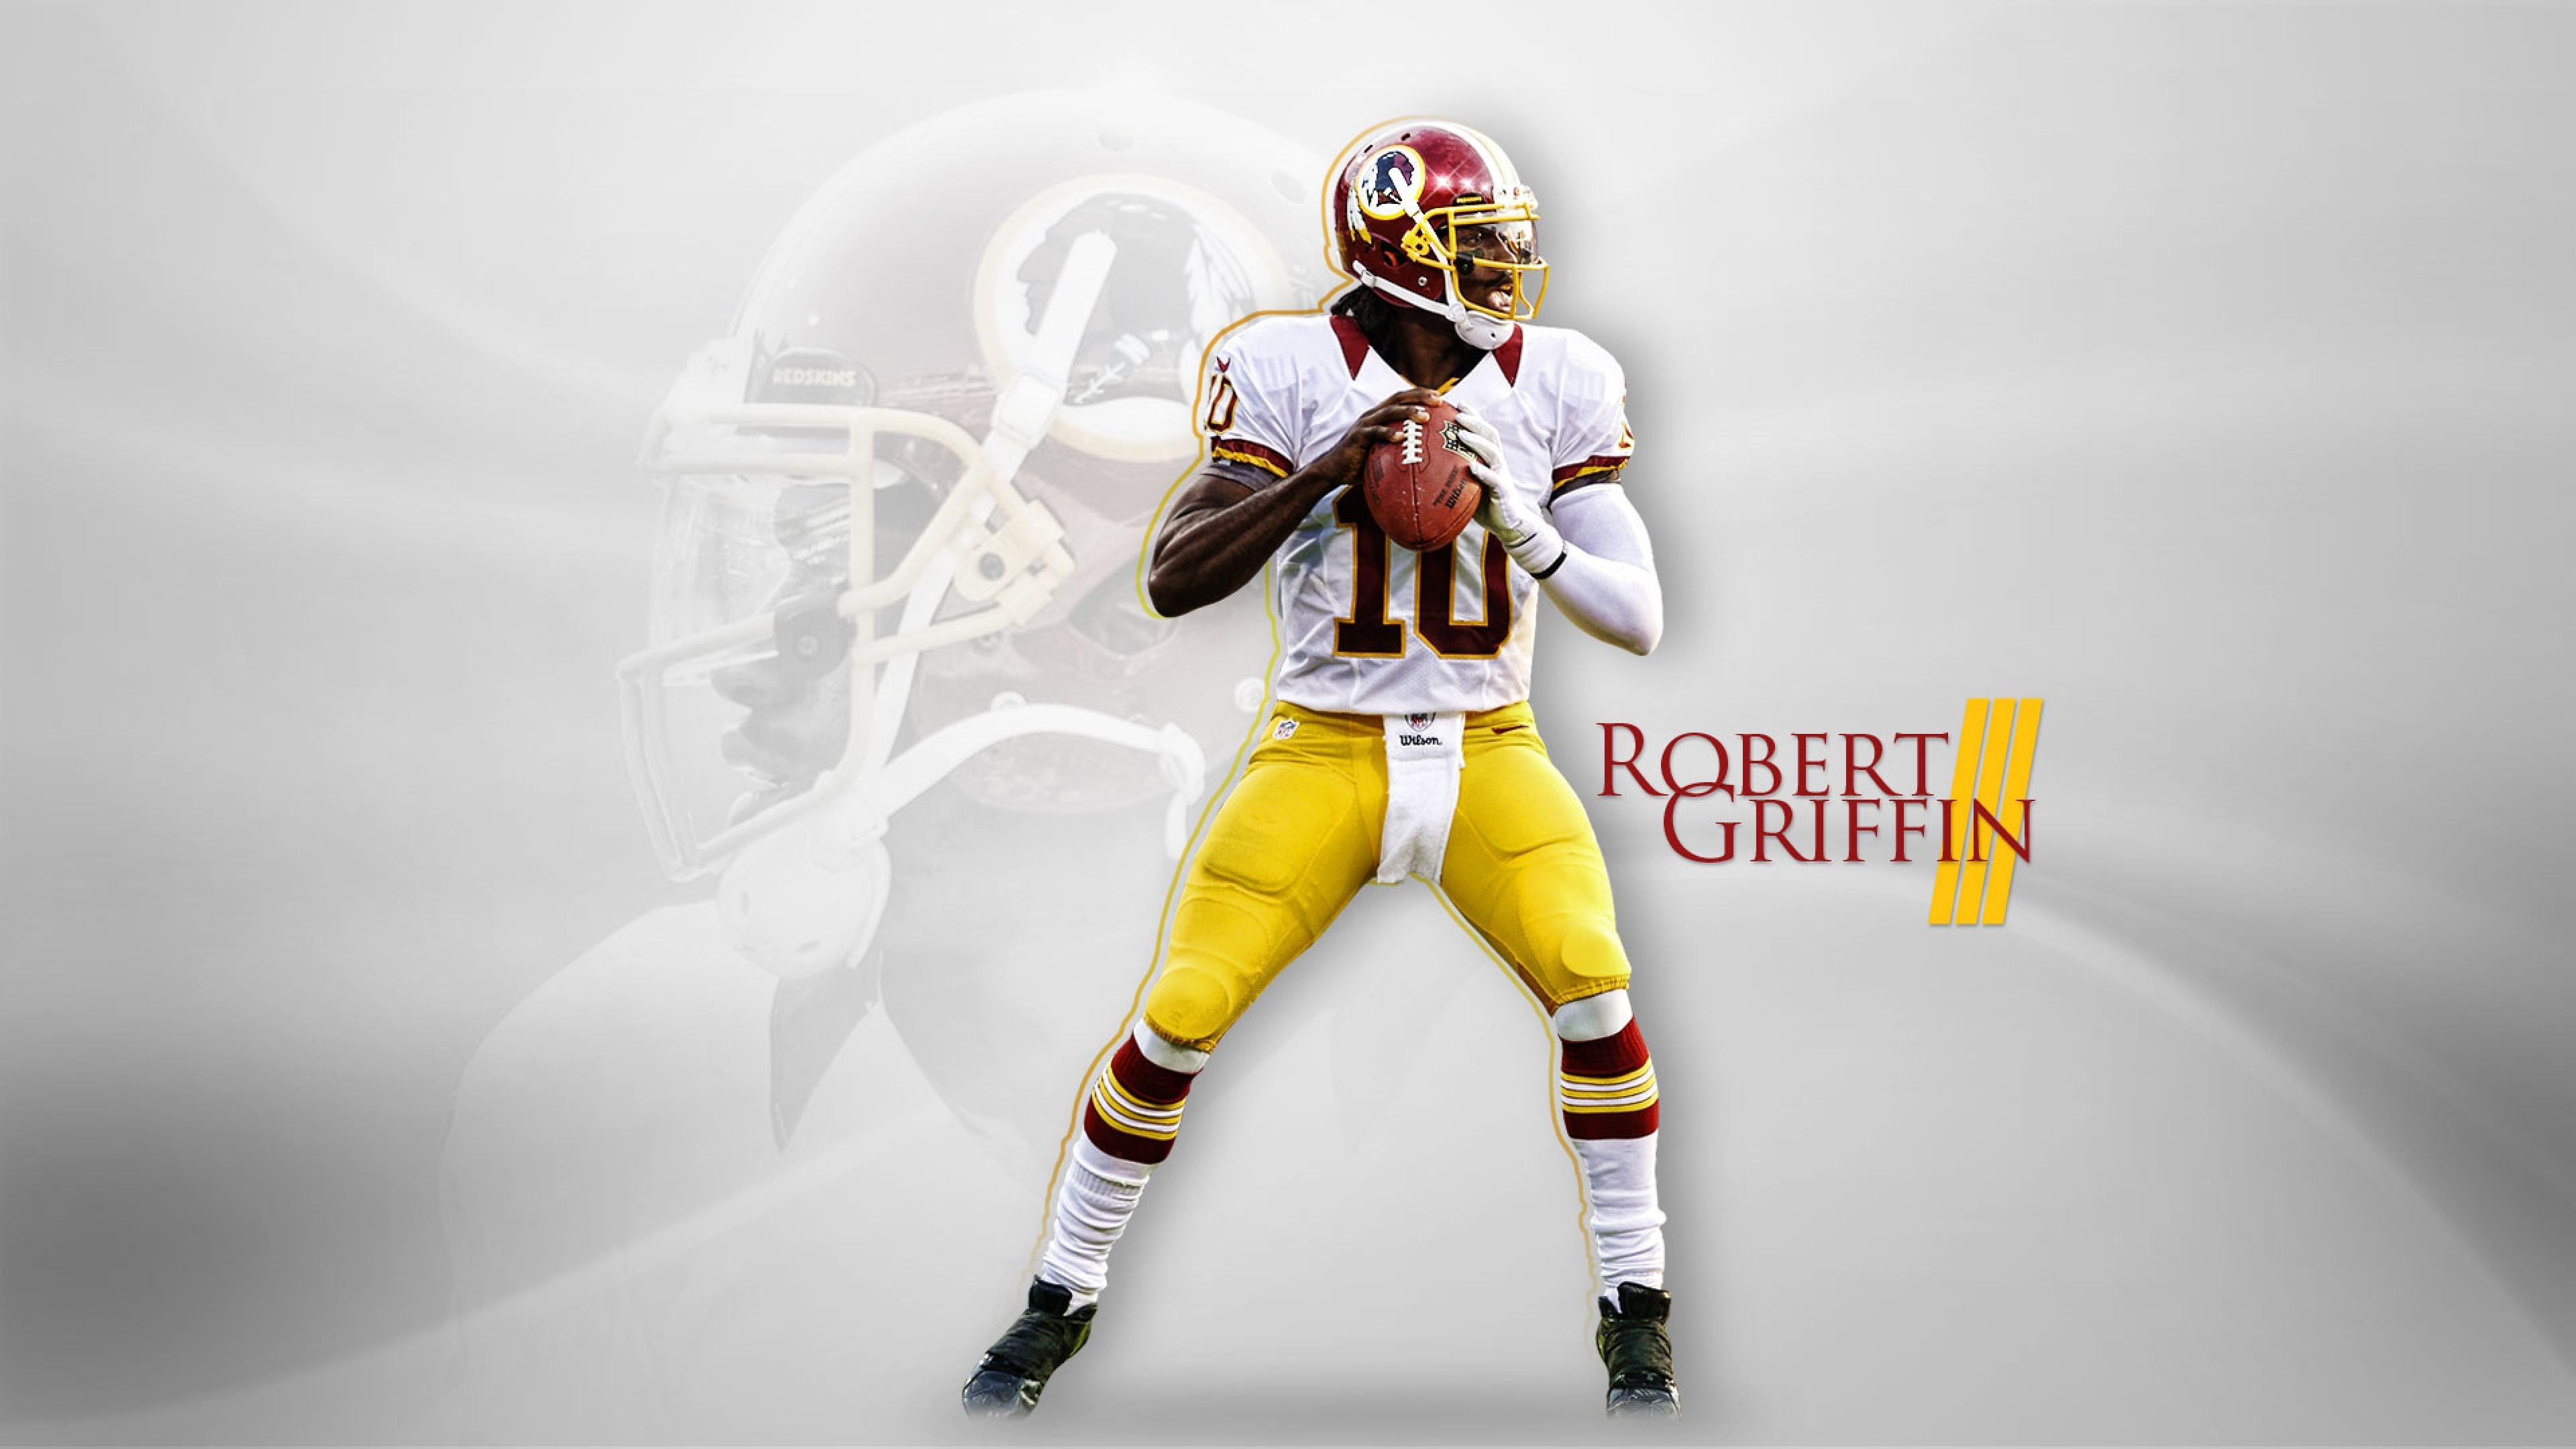 Wallpaper robert griffin iii, rg 3, american football,  quarterback, washington redskins